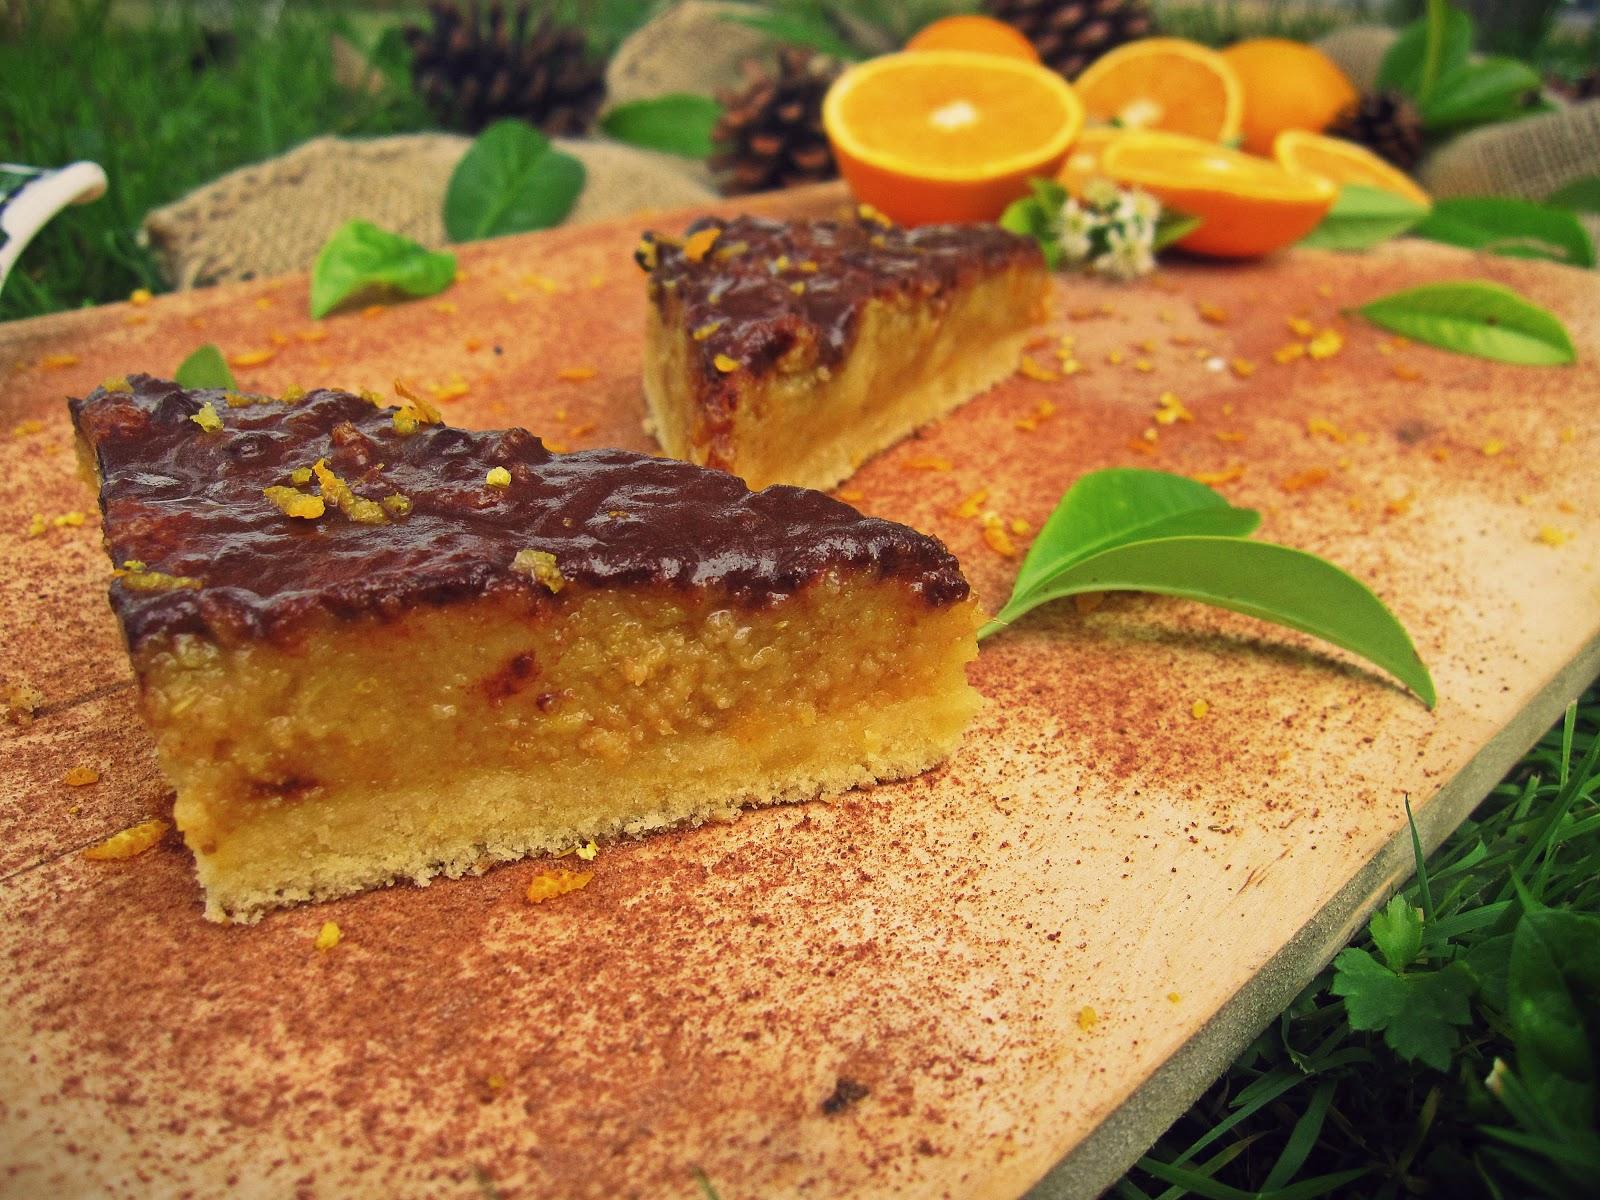 Jaffa Cakes Orange Or Apricot